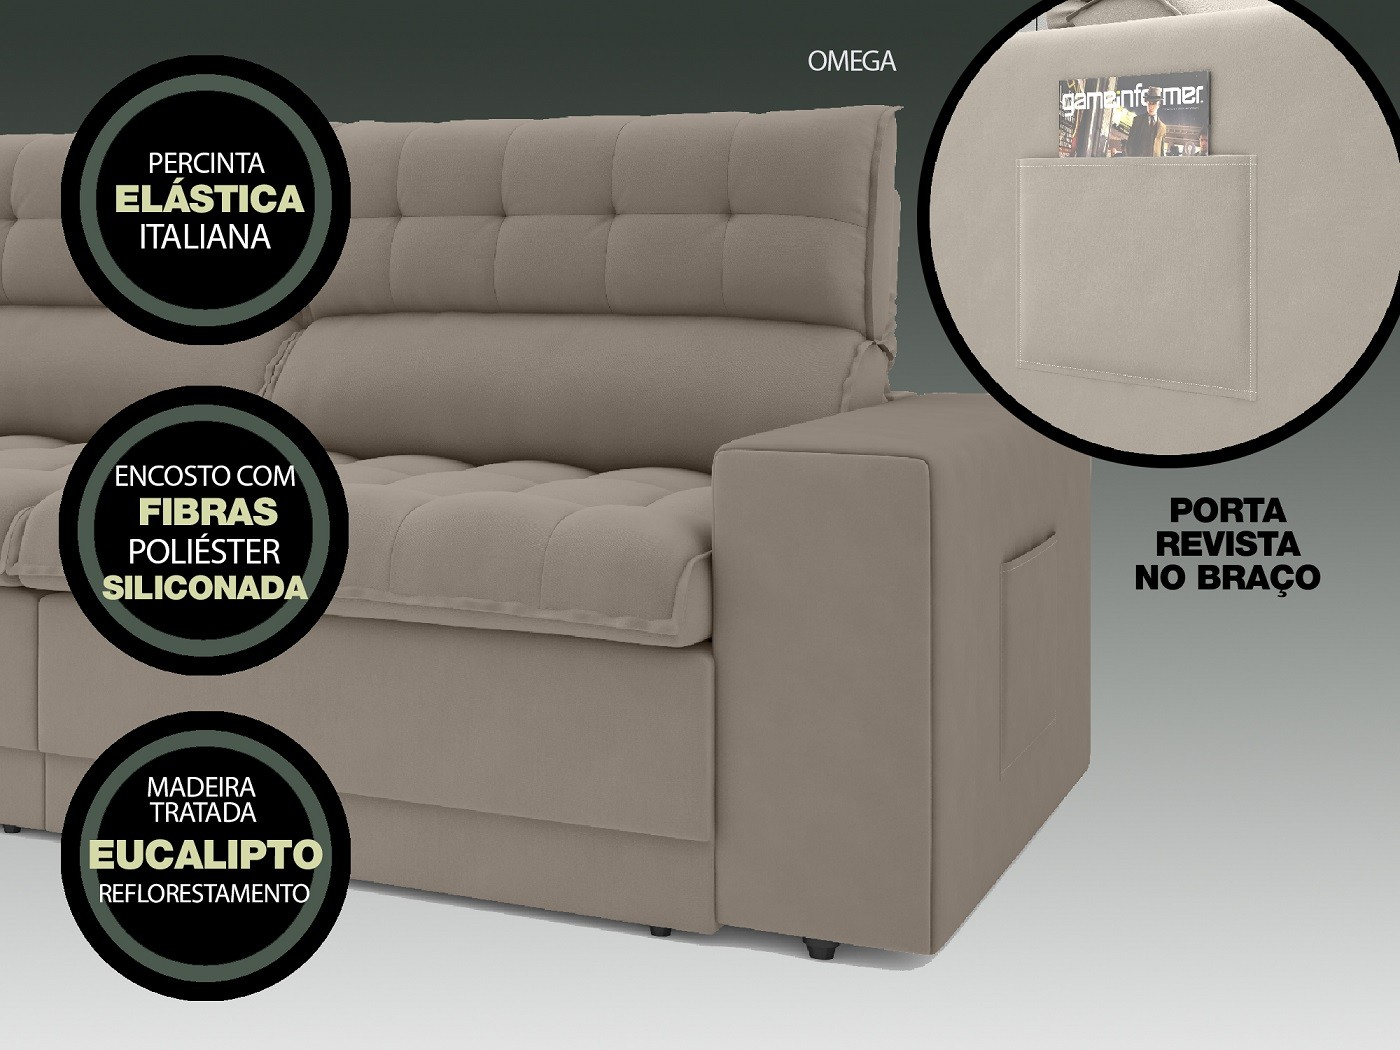 Sofá Omega 2,50m Assento Retrátil e Reclinável Velosuede Bege - NETSOFAS  - NETSOFÁS